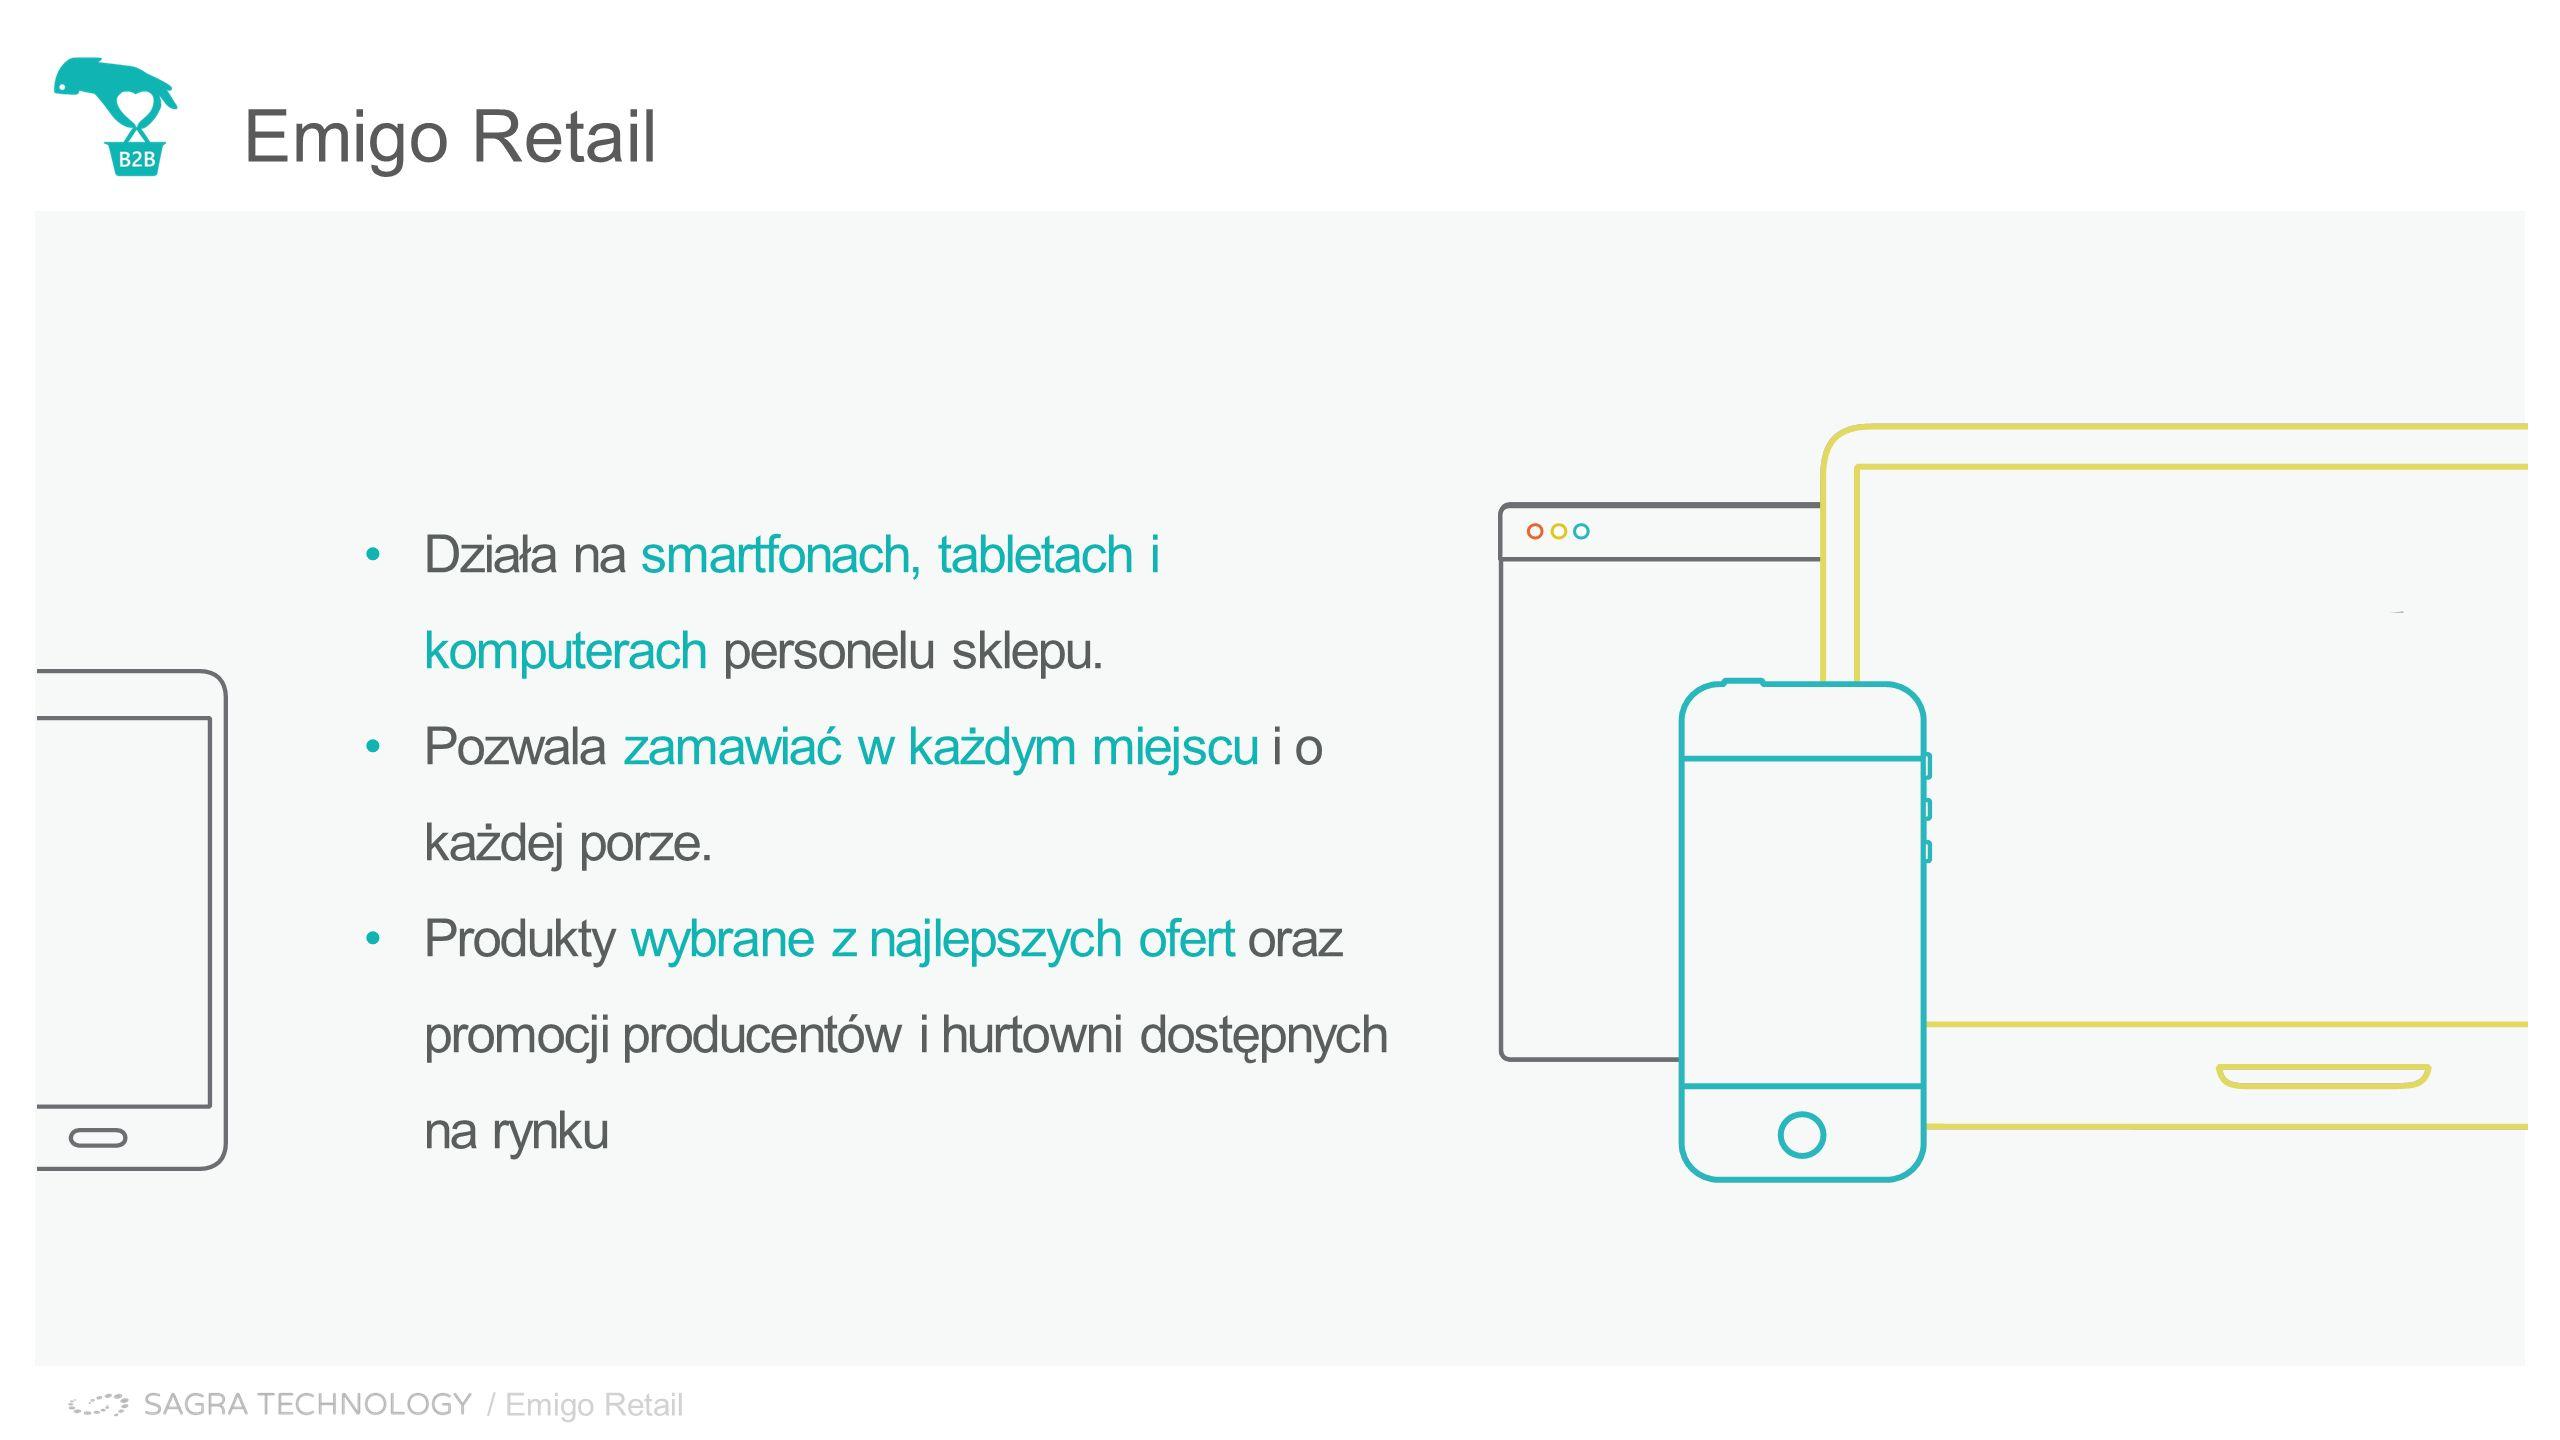 Emigo Retail / Emigo Retail Działa na smartfonach, tabletach i komputerach personelu sklepu.